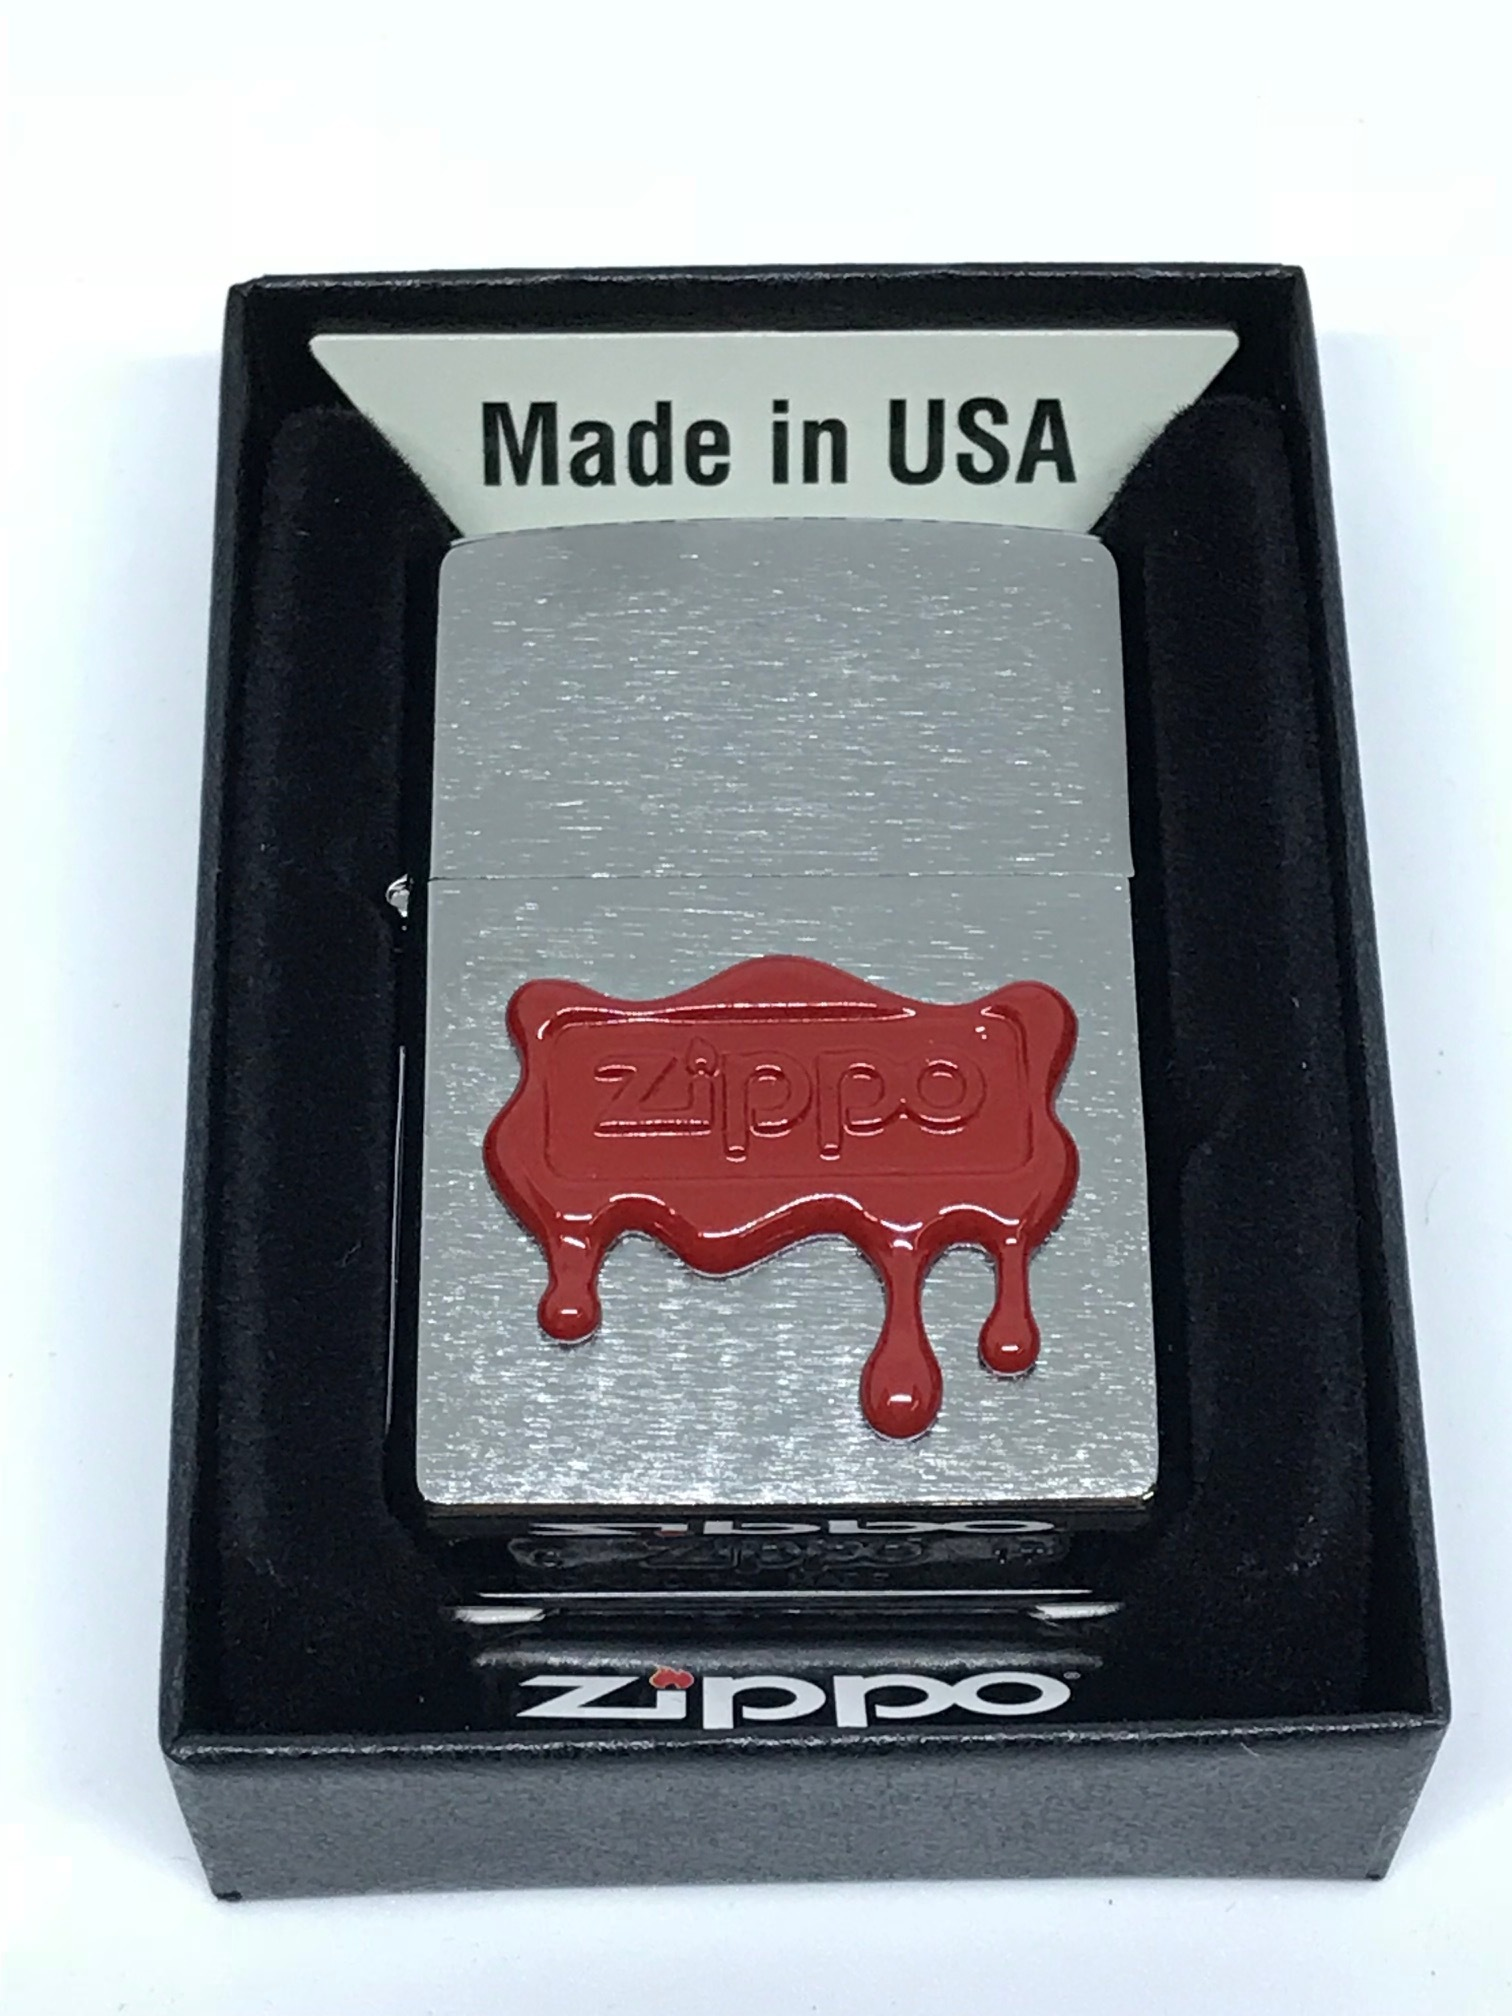 Zippo Red Wax ntz572 2